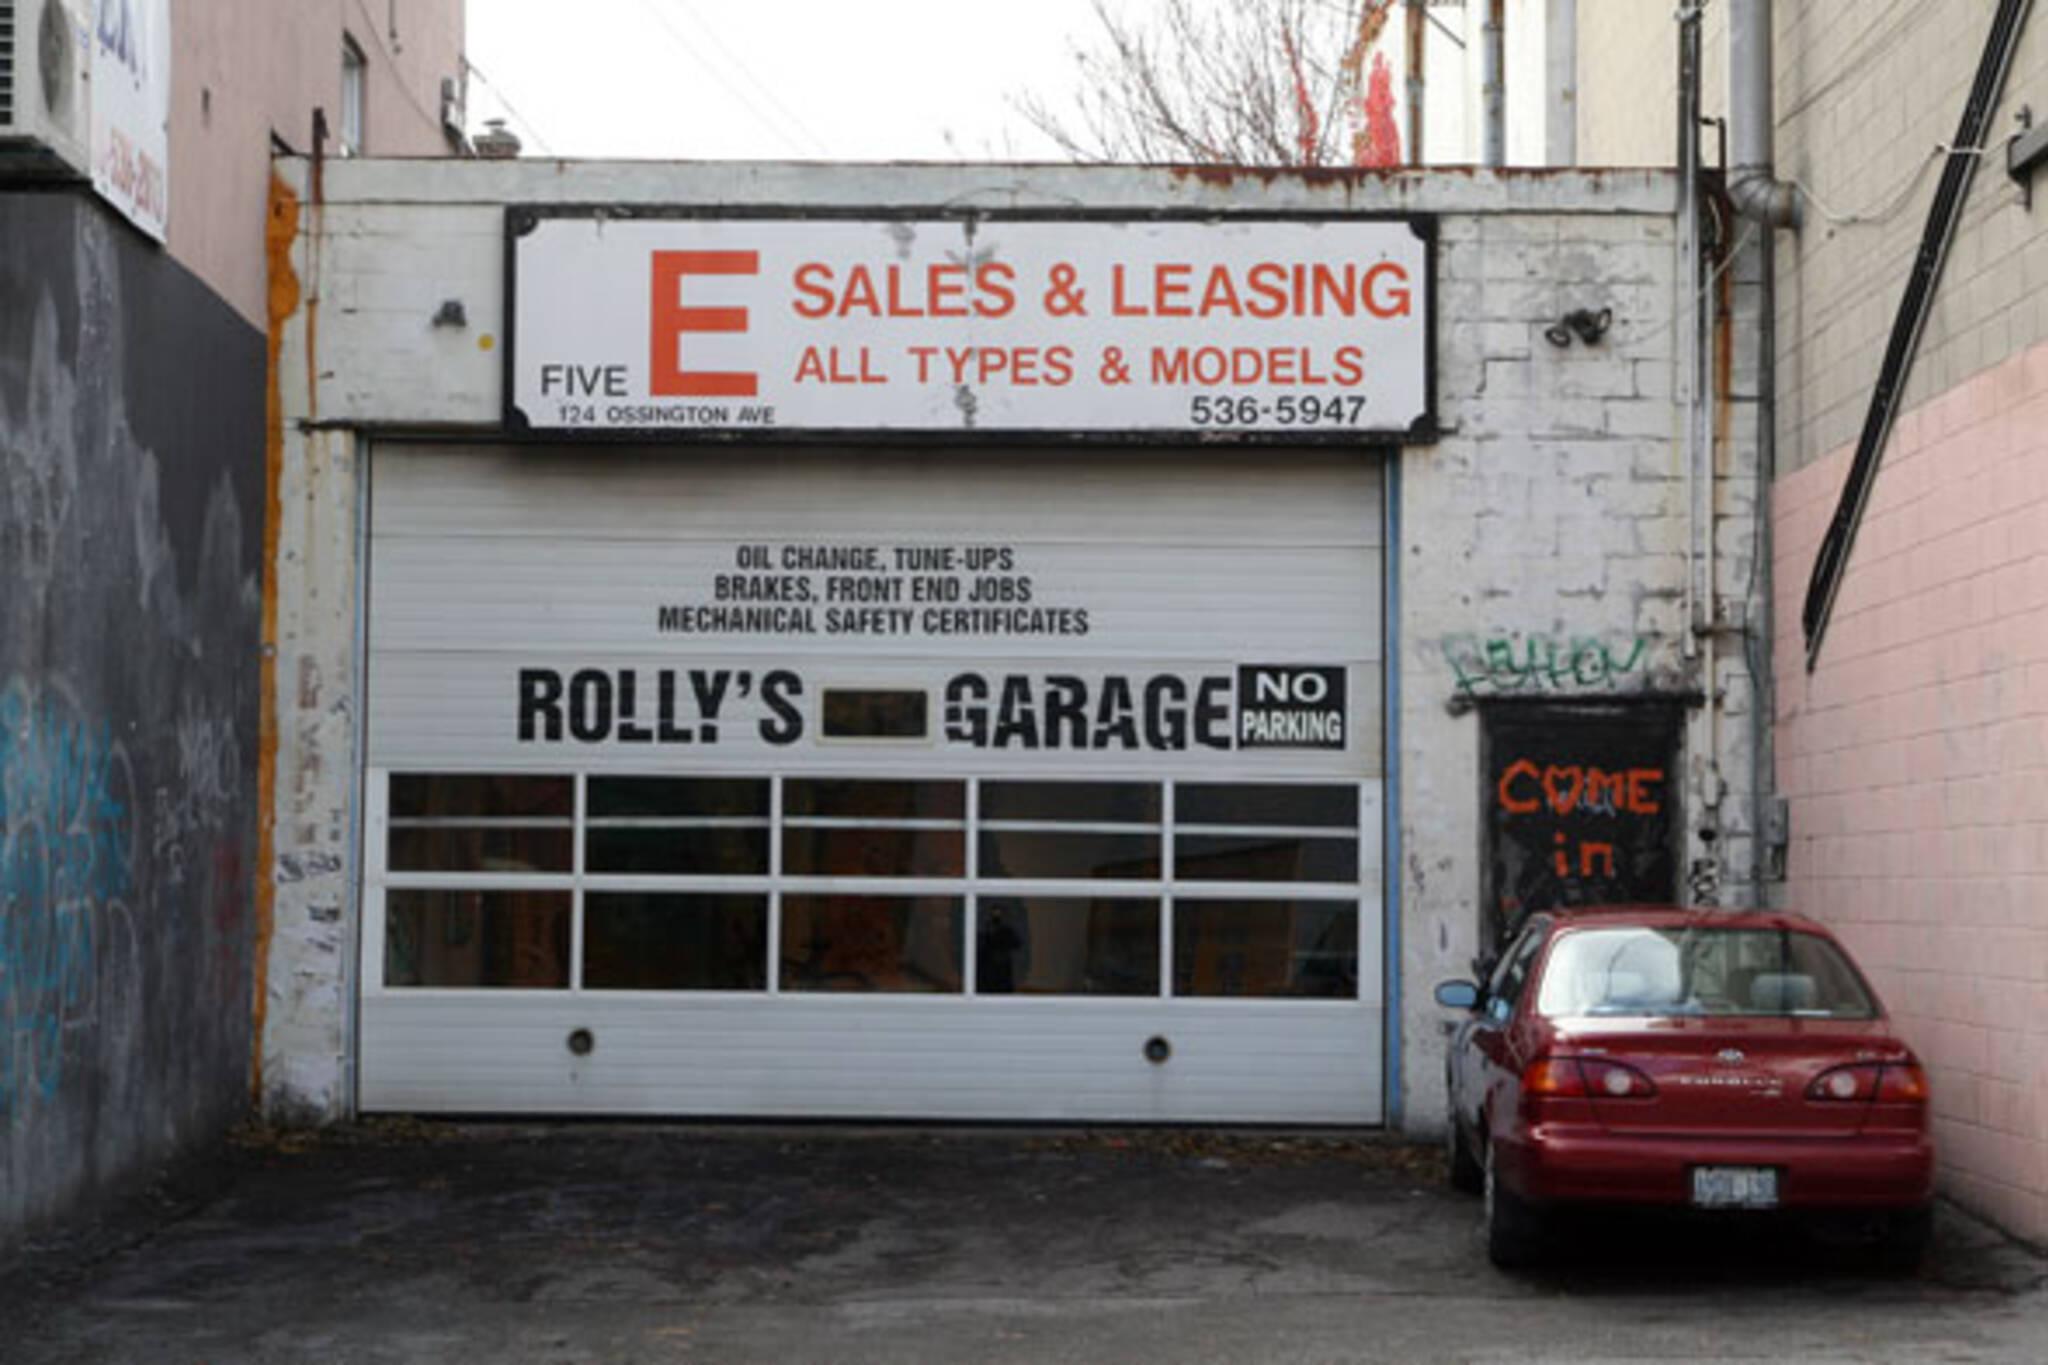 Rolly's Garage